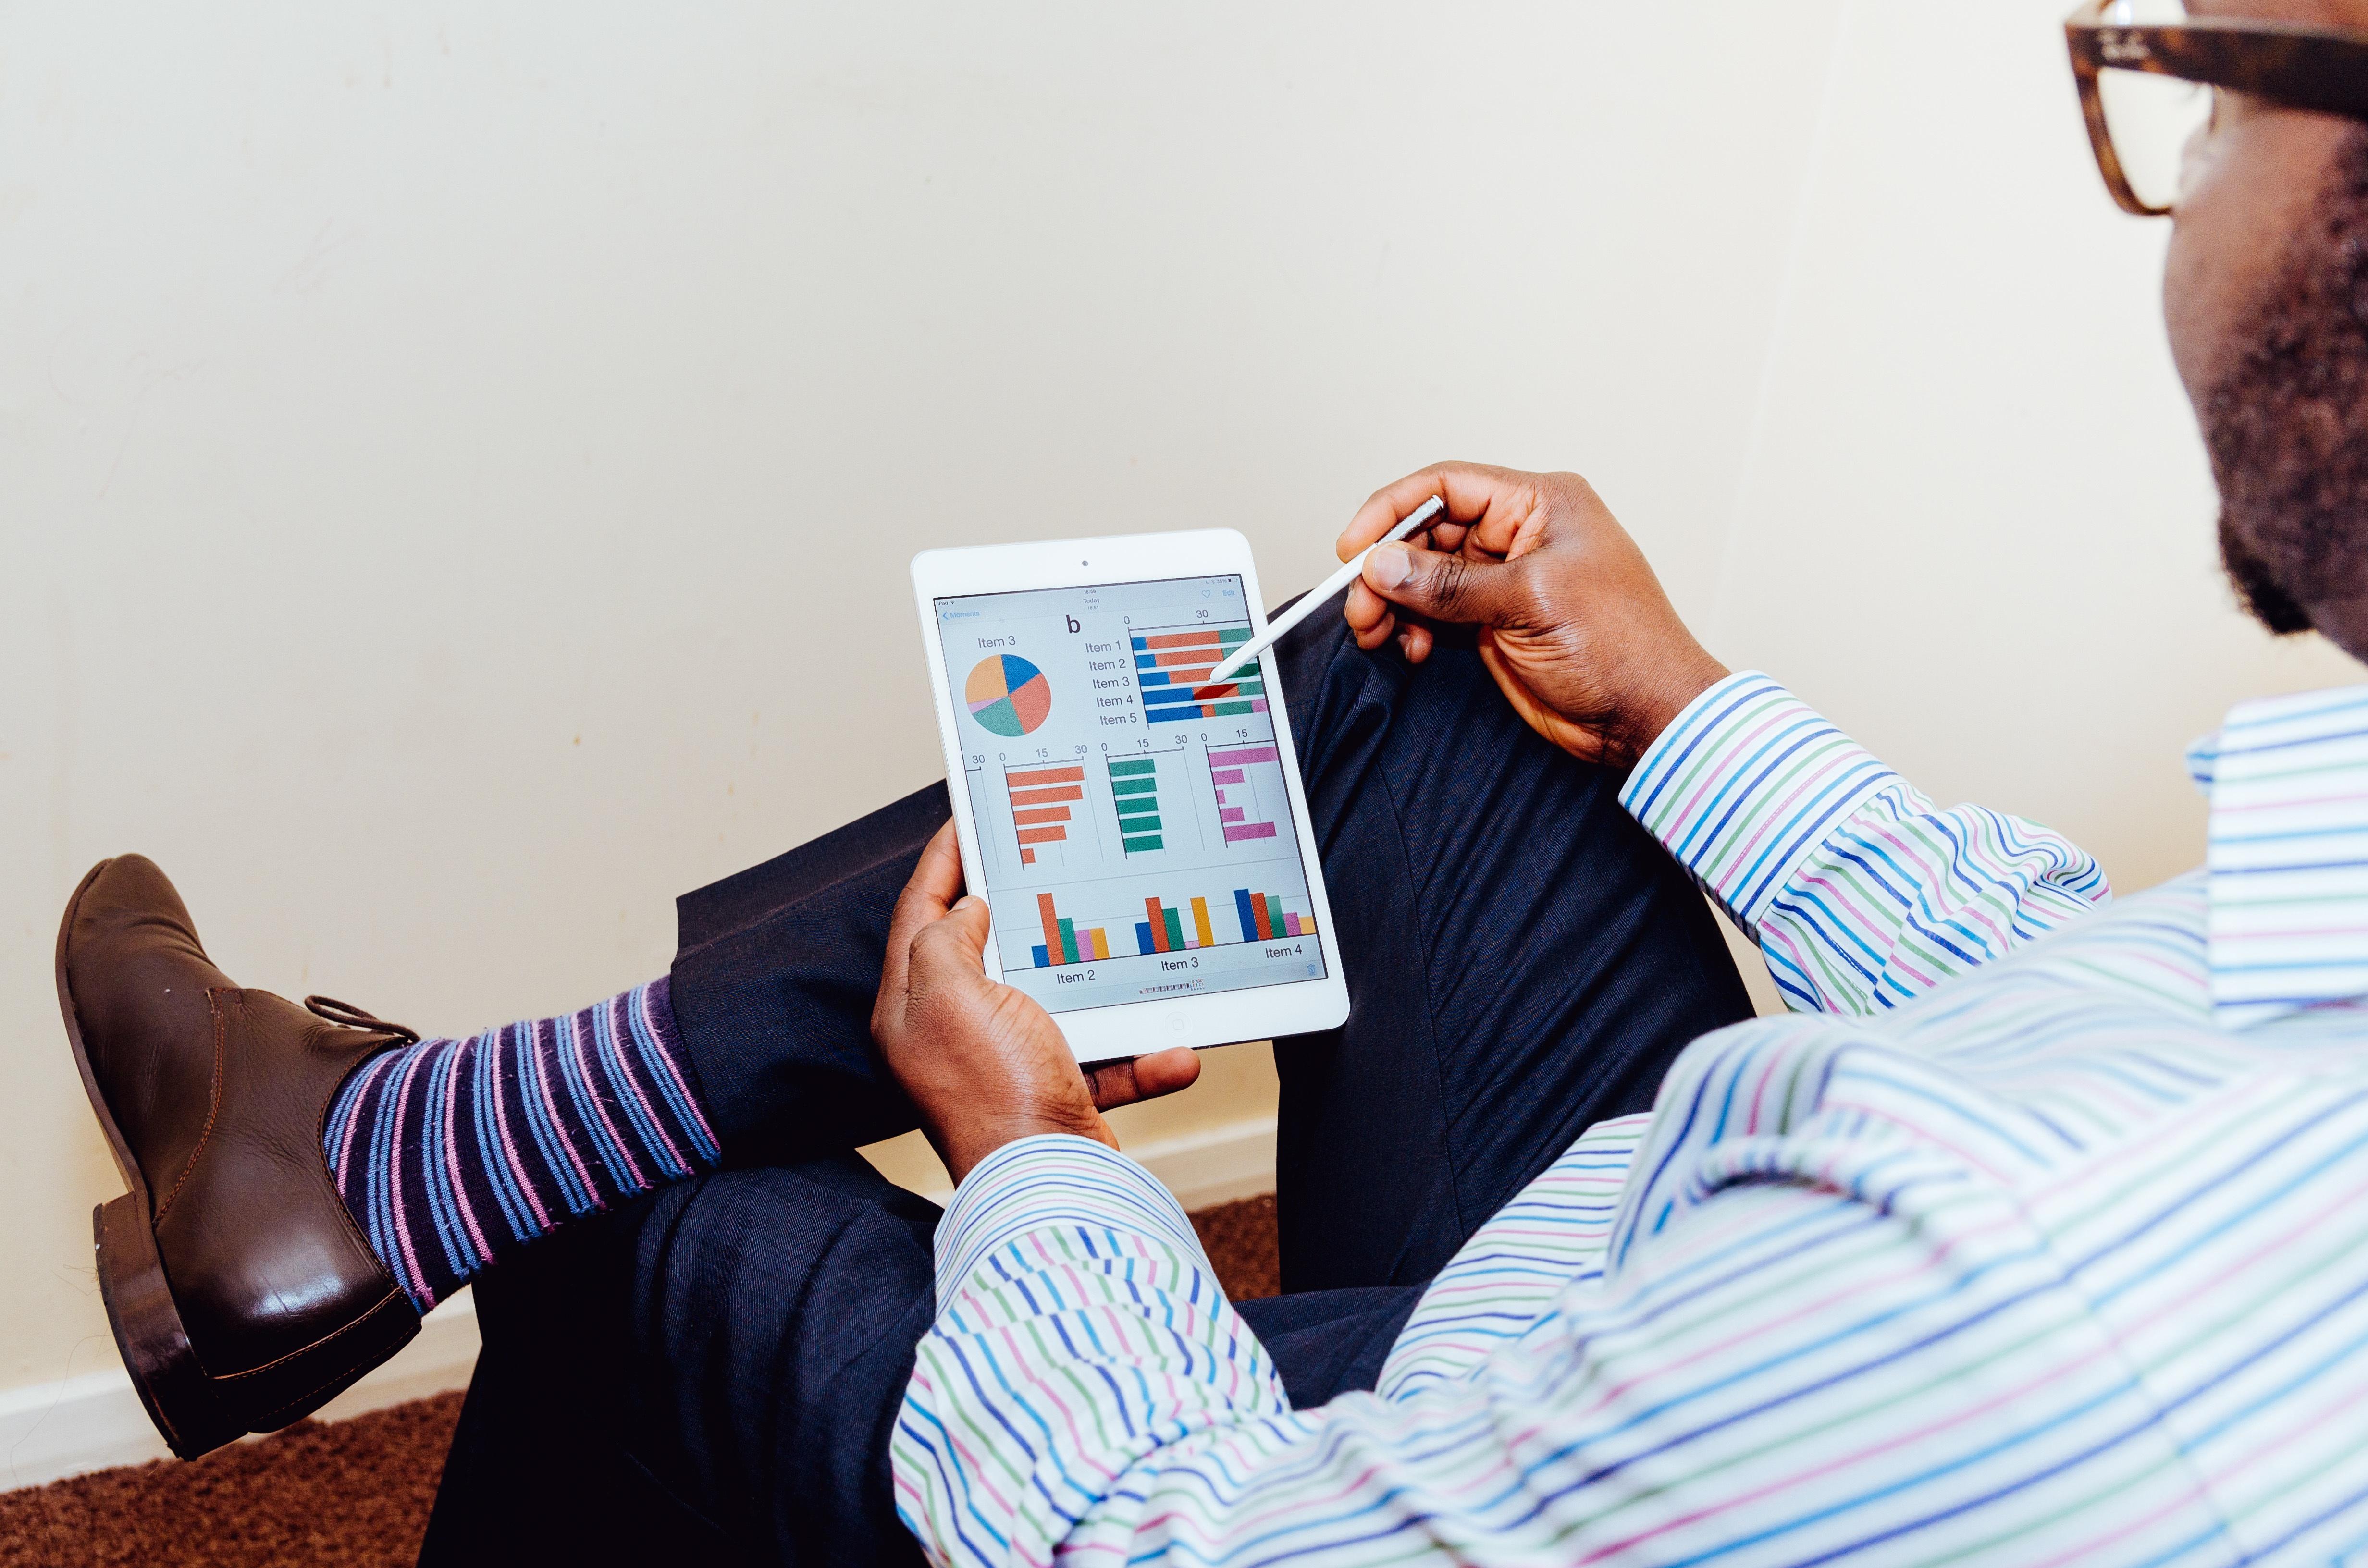 Man reviewing charts on an ipad